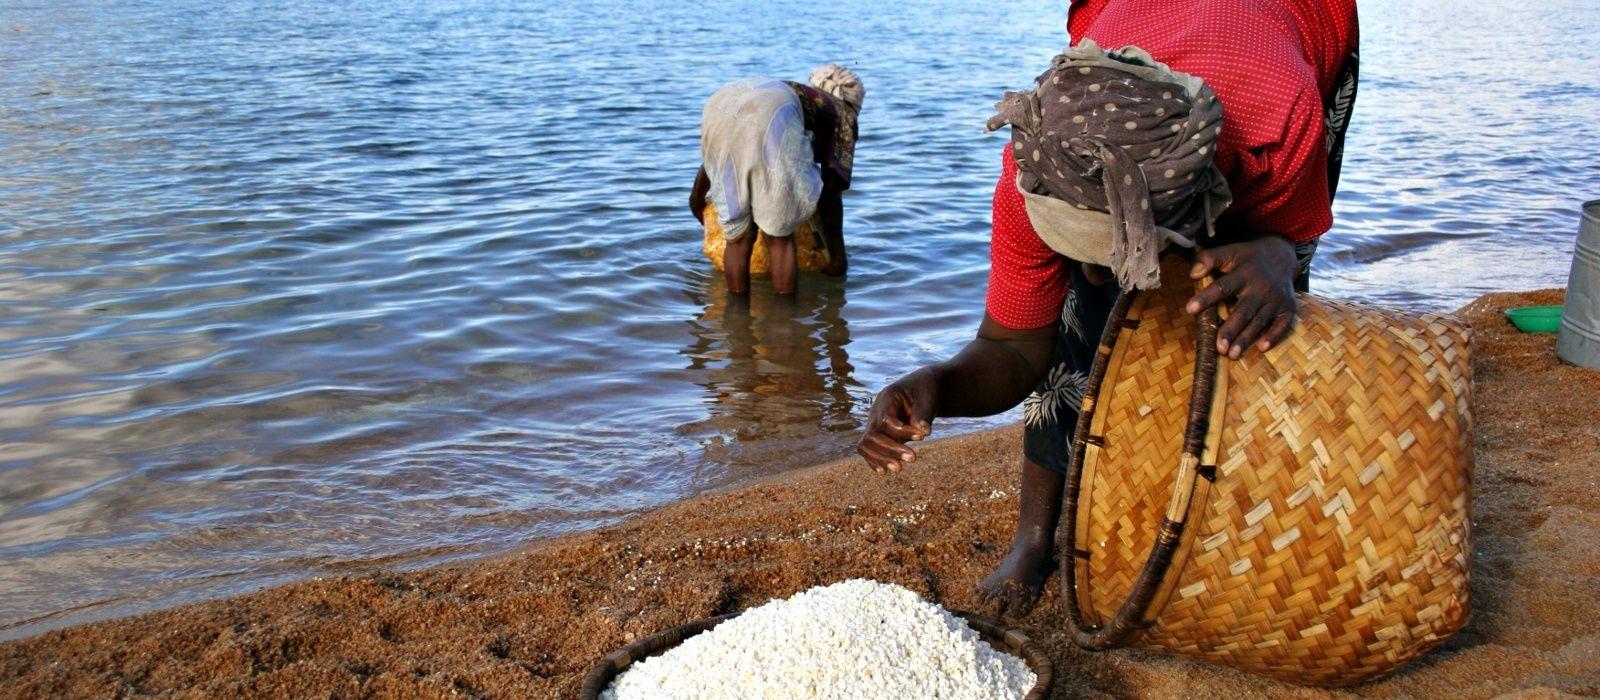 Destination Likoma Island Malawi